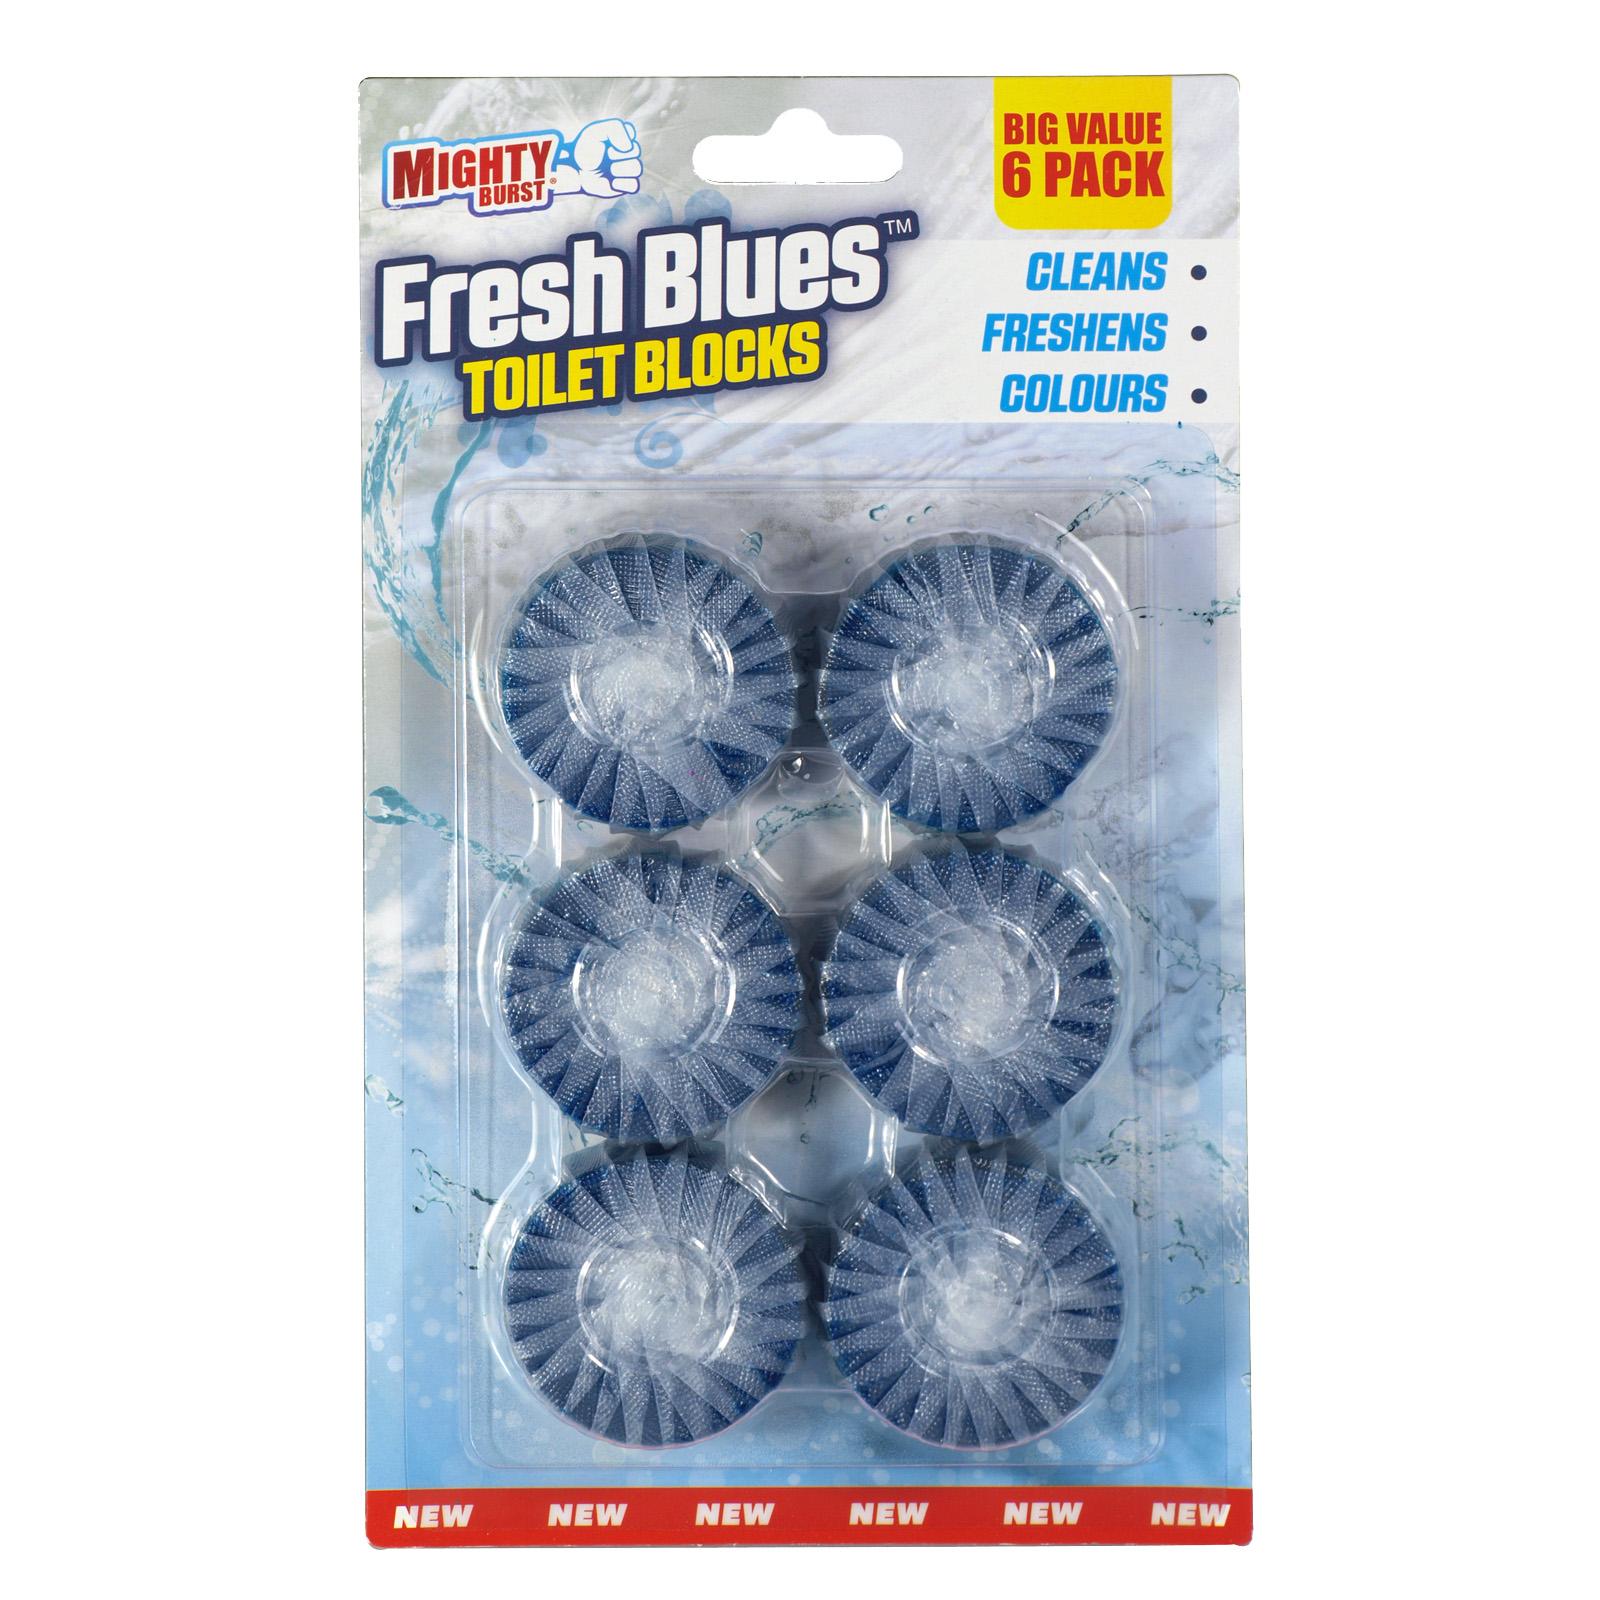 MIGHTY BURST 6X50G TOILET BLOCKS BLUE X12